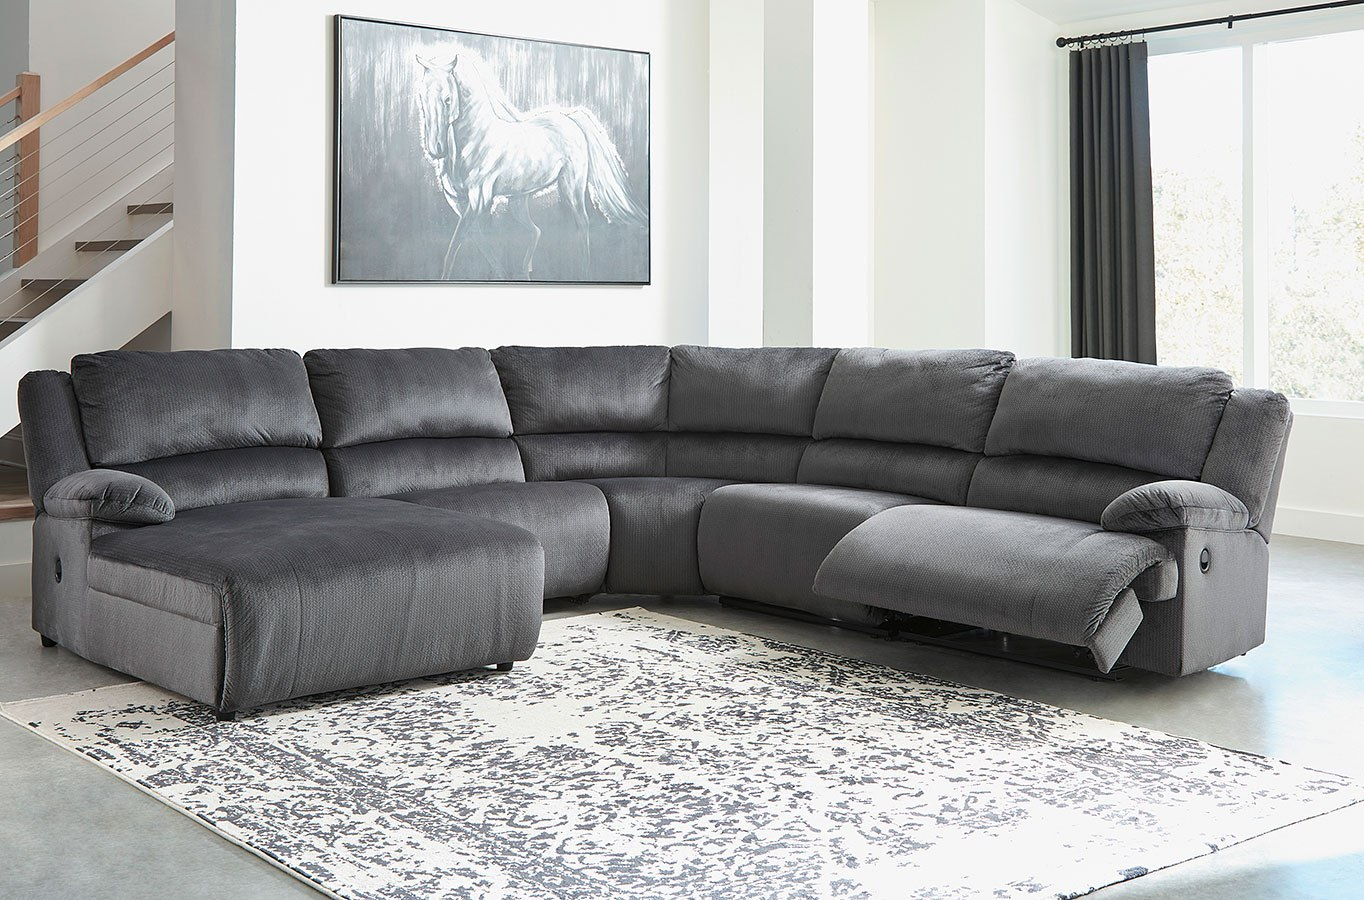 Clonmel Charcoal Modular Reclining Sectional Signature Design Furniture Cart